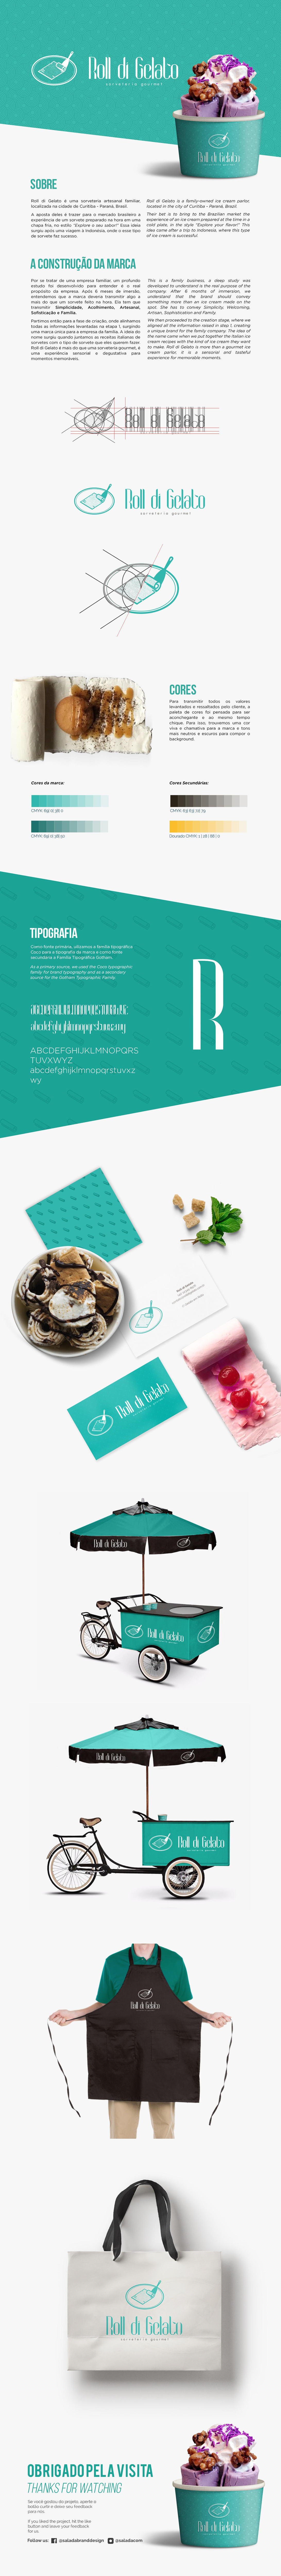 brand ice cream innovation Gelato marca simplicidade artesanal familia experiencia Food